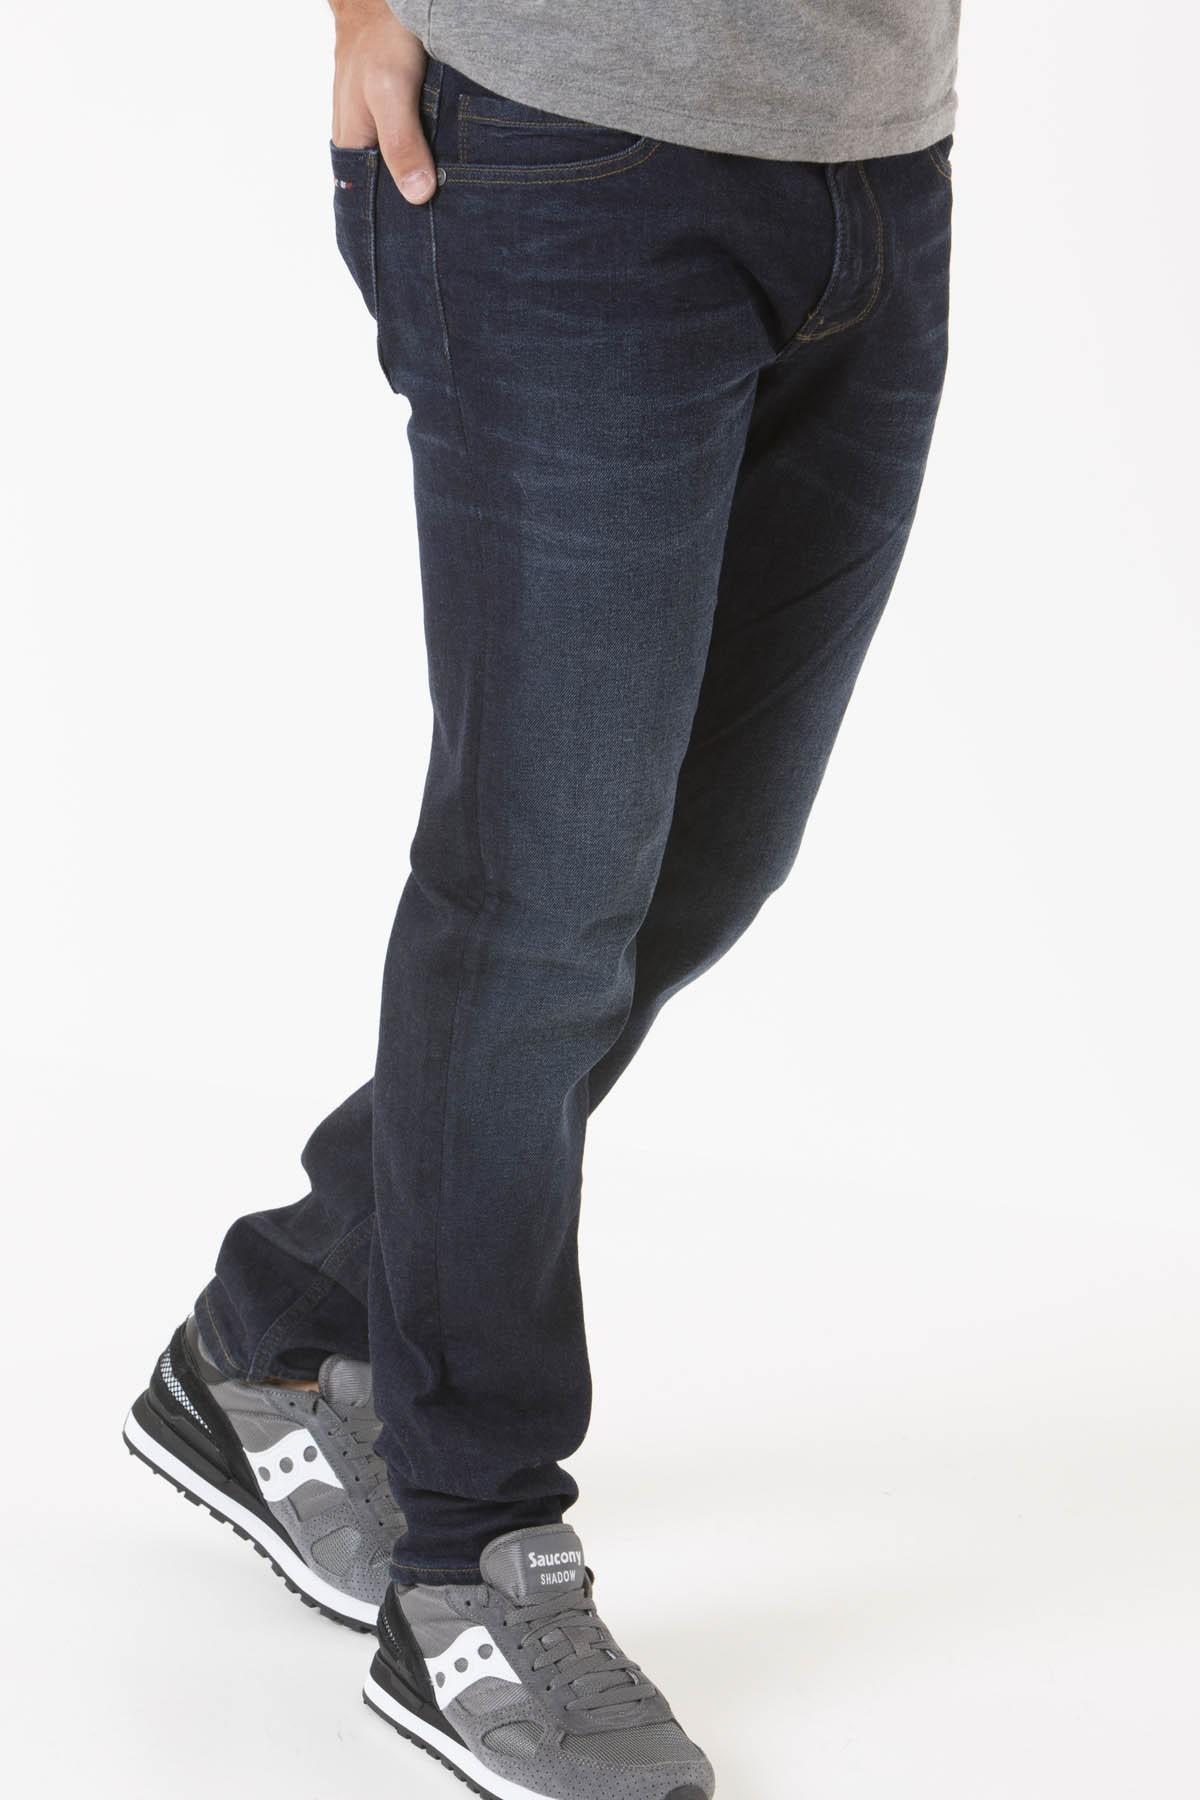 Männer Jeans NAPAPIJRI H/W 18-19